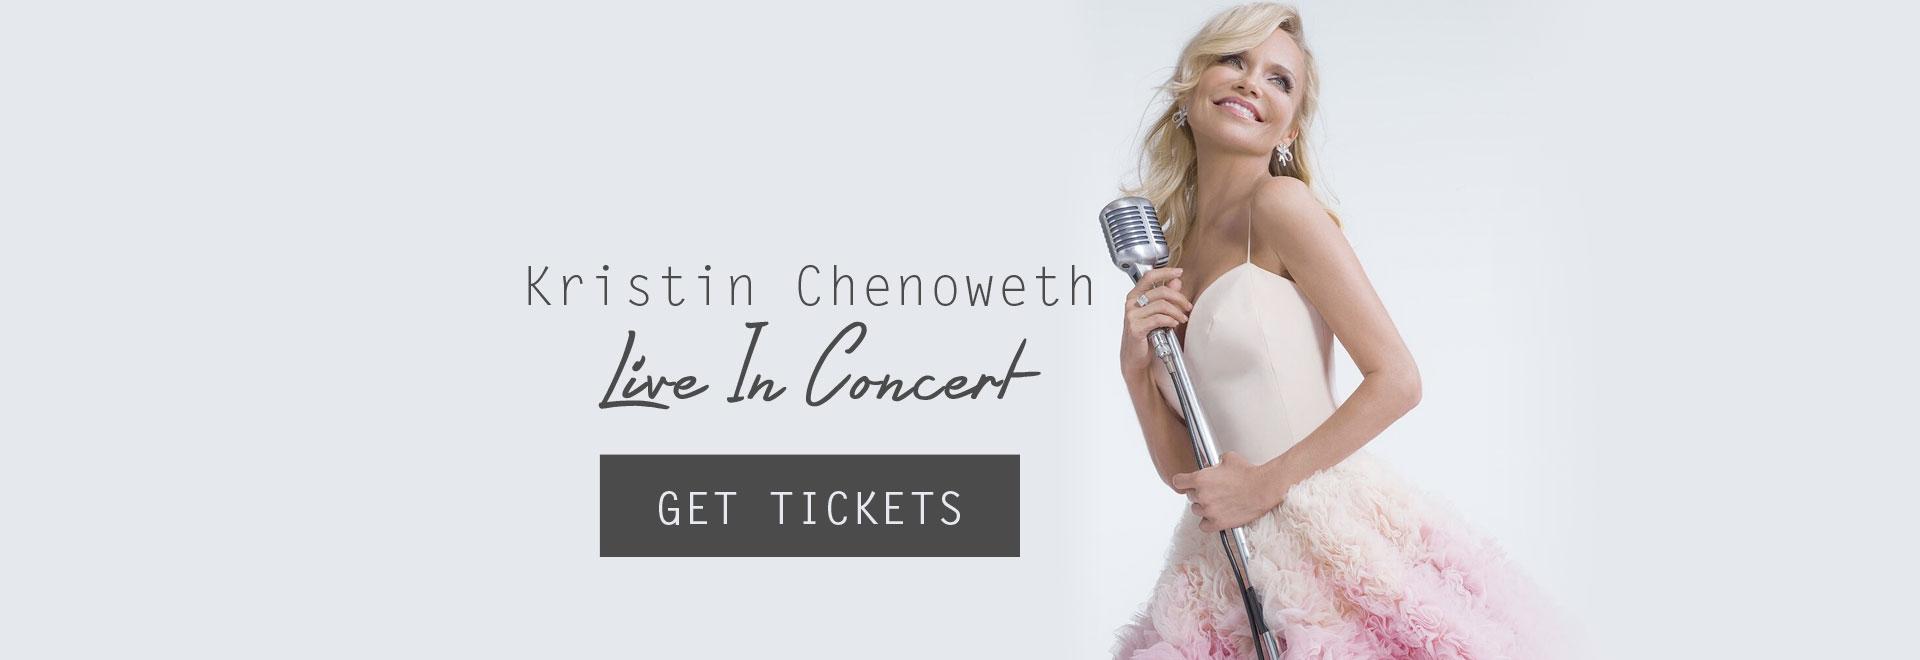 Kristin Chenoweth Live In Concert